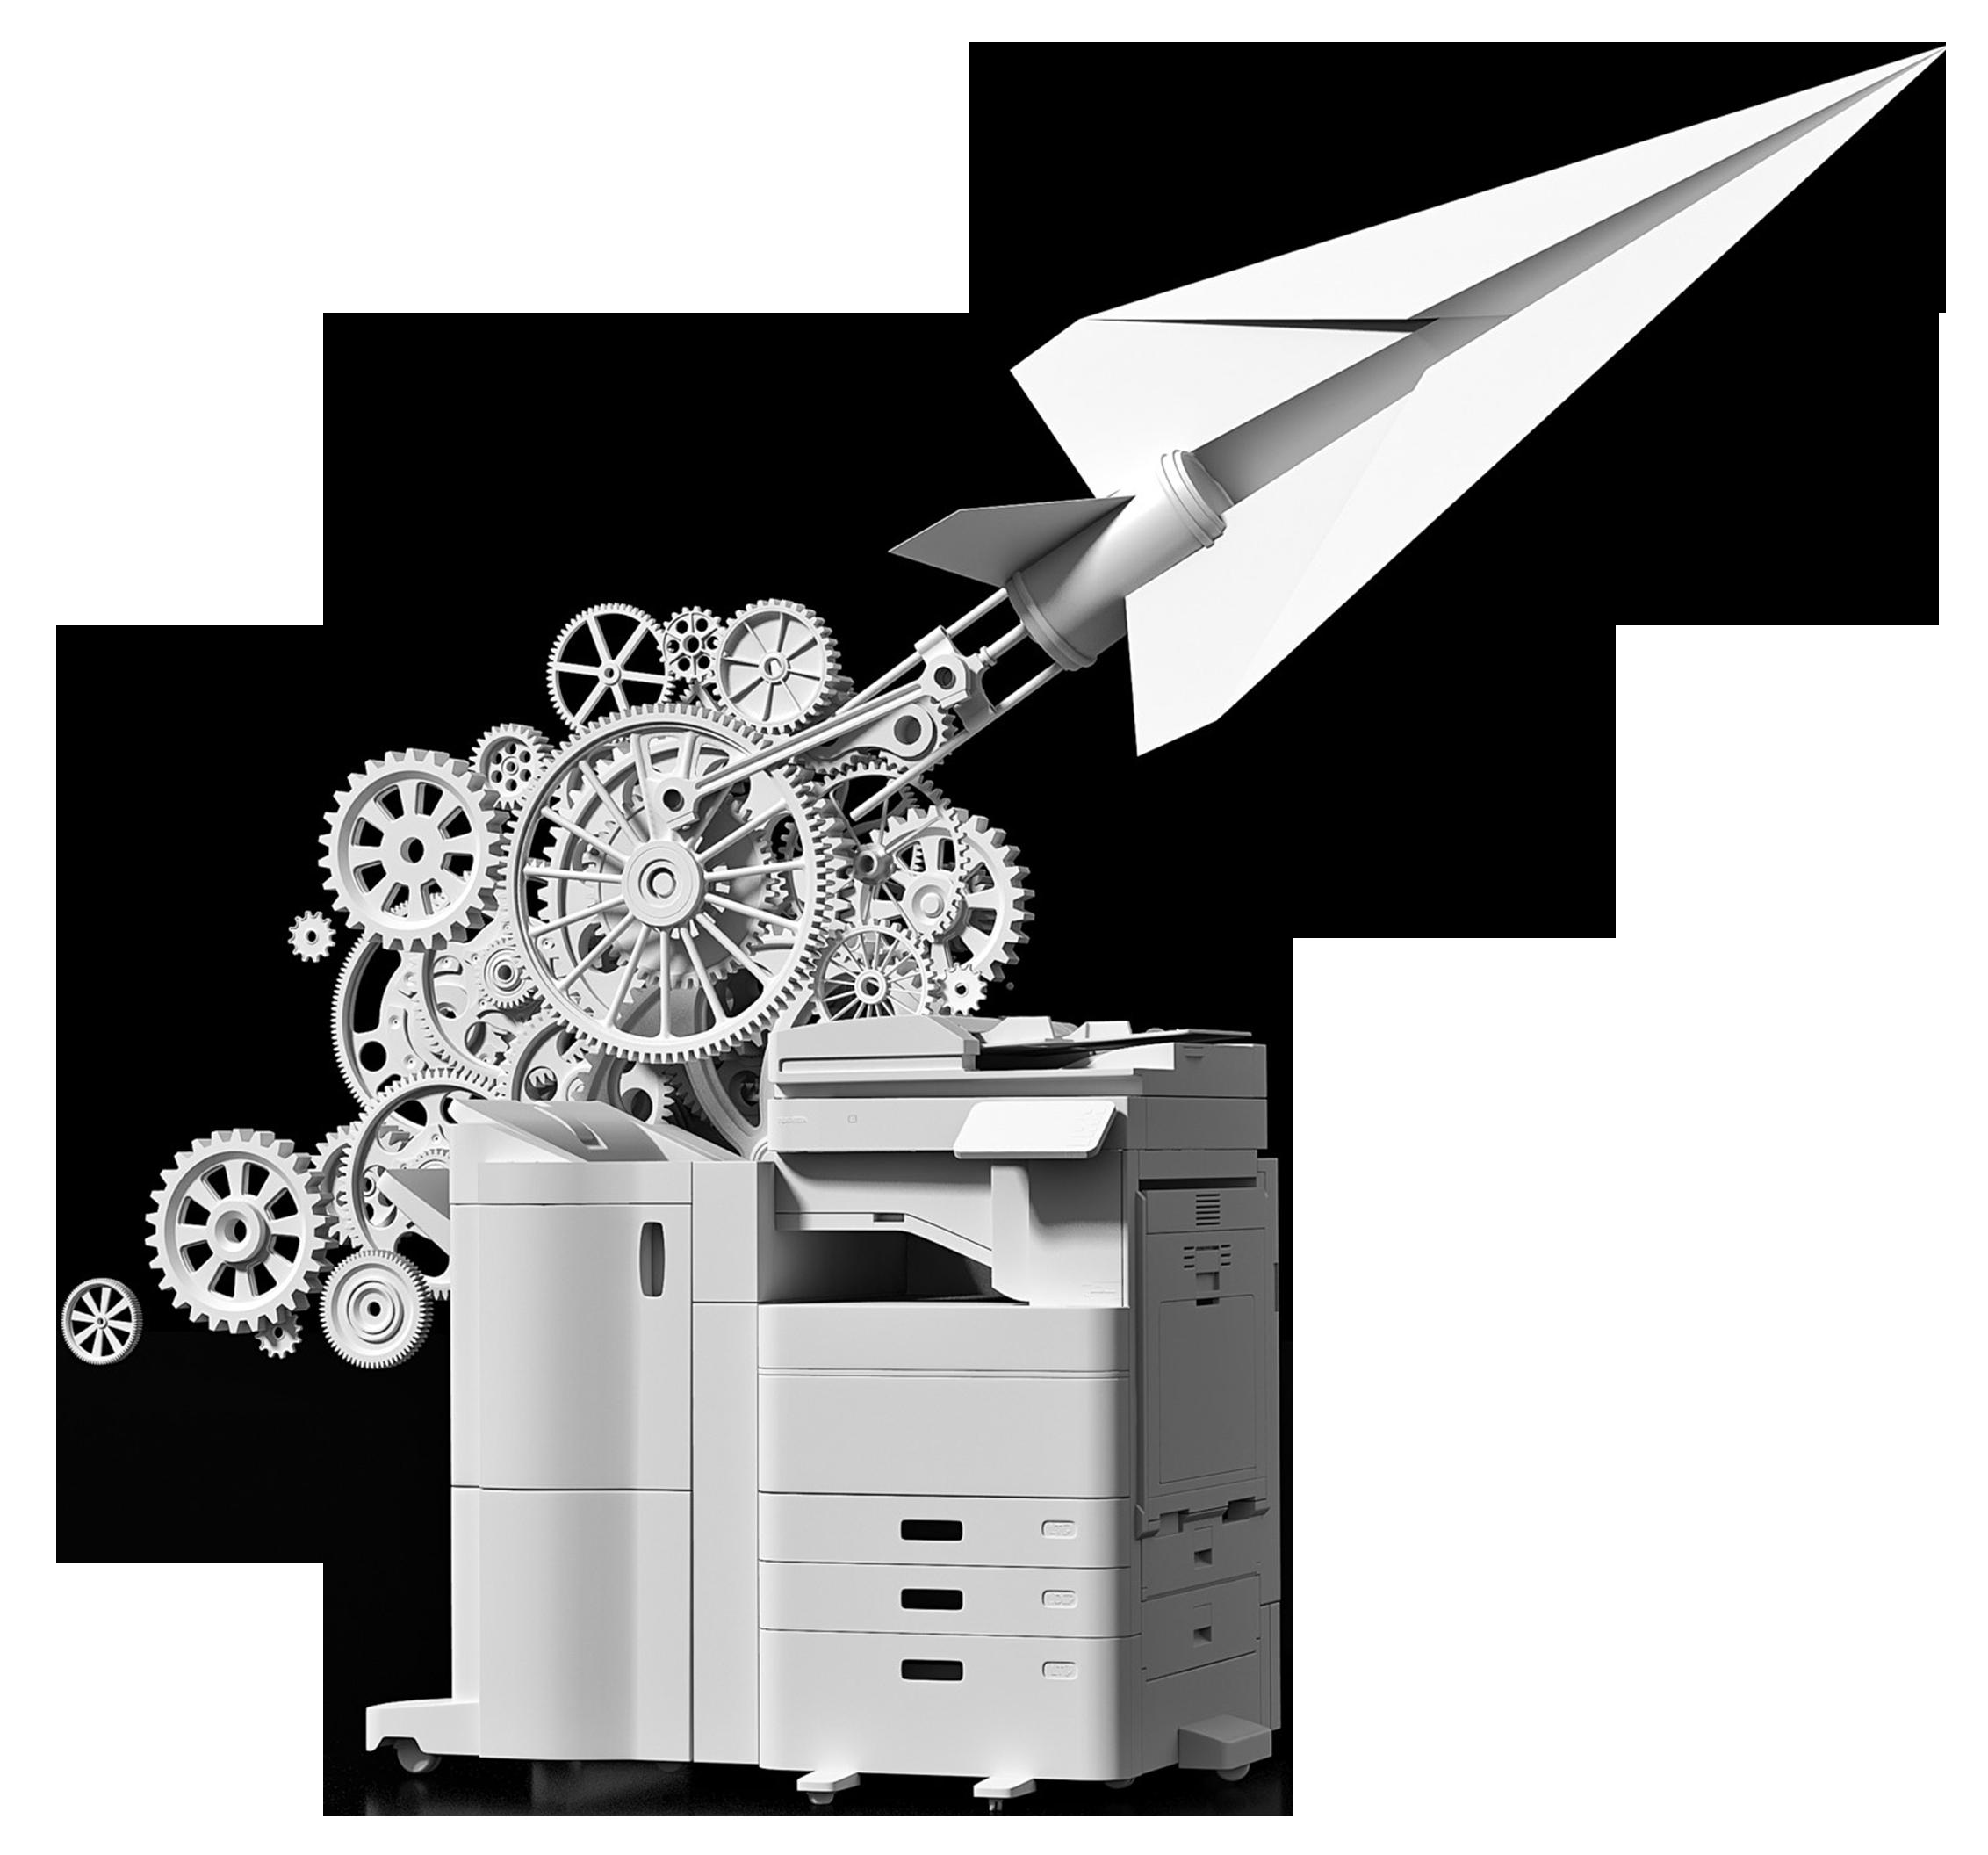 printer toshiba